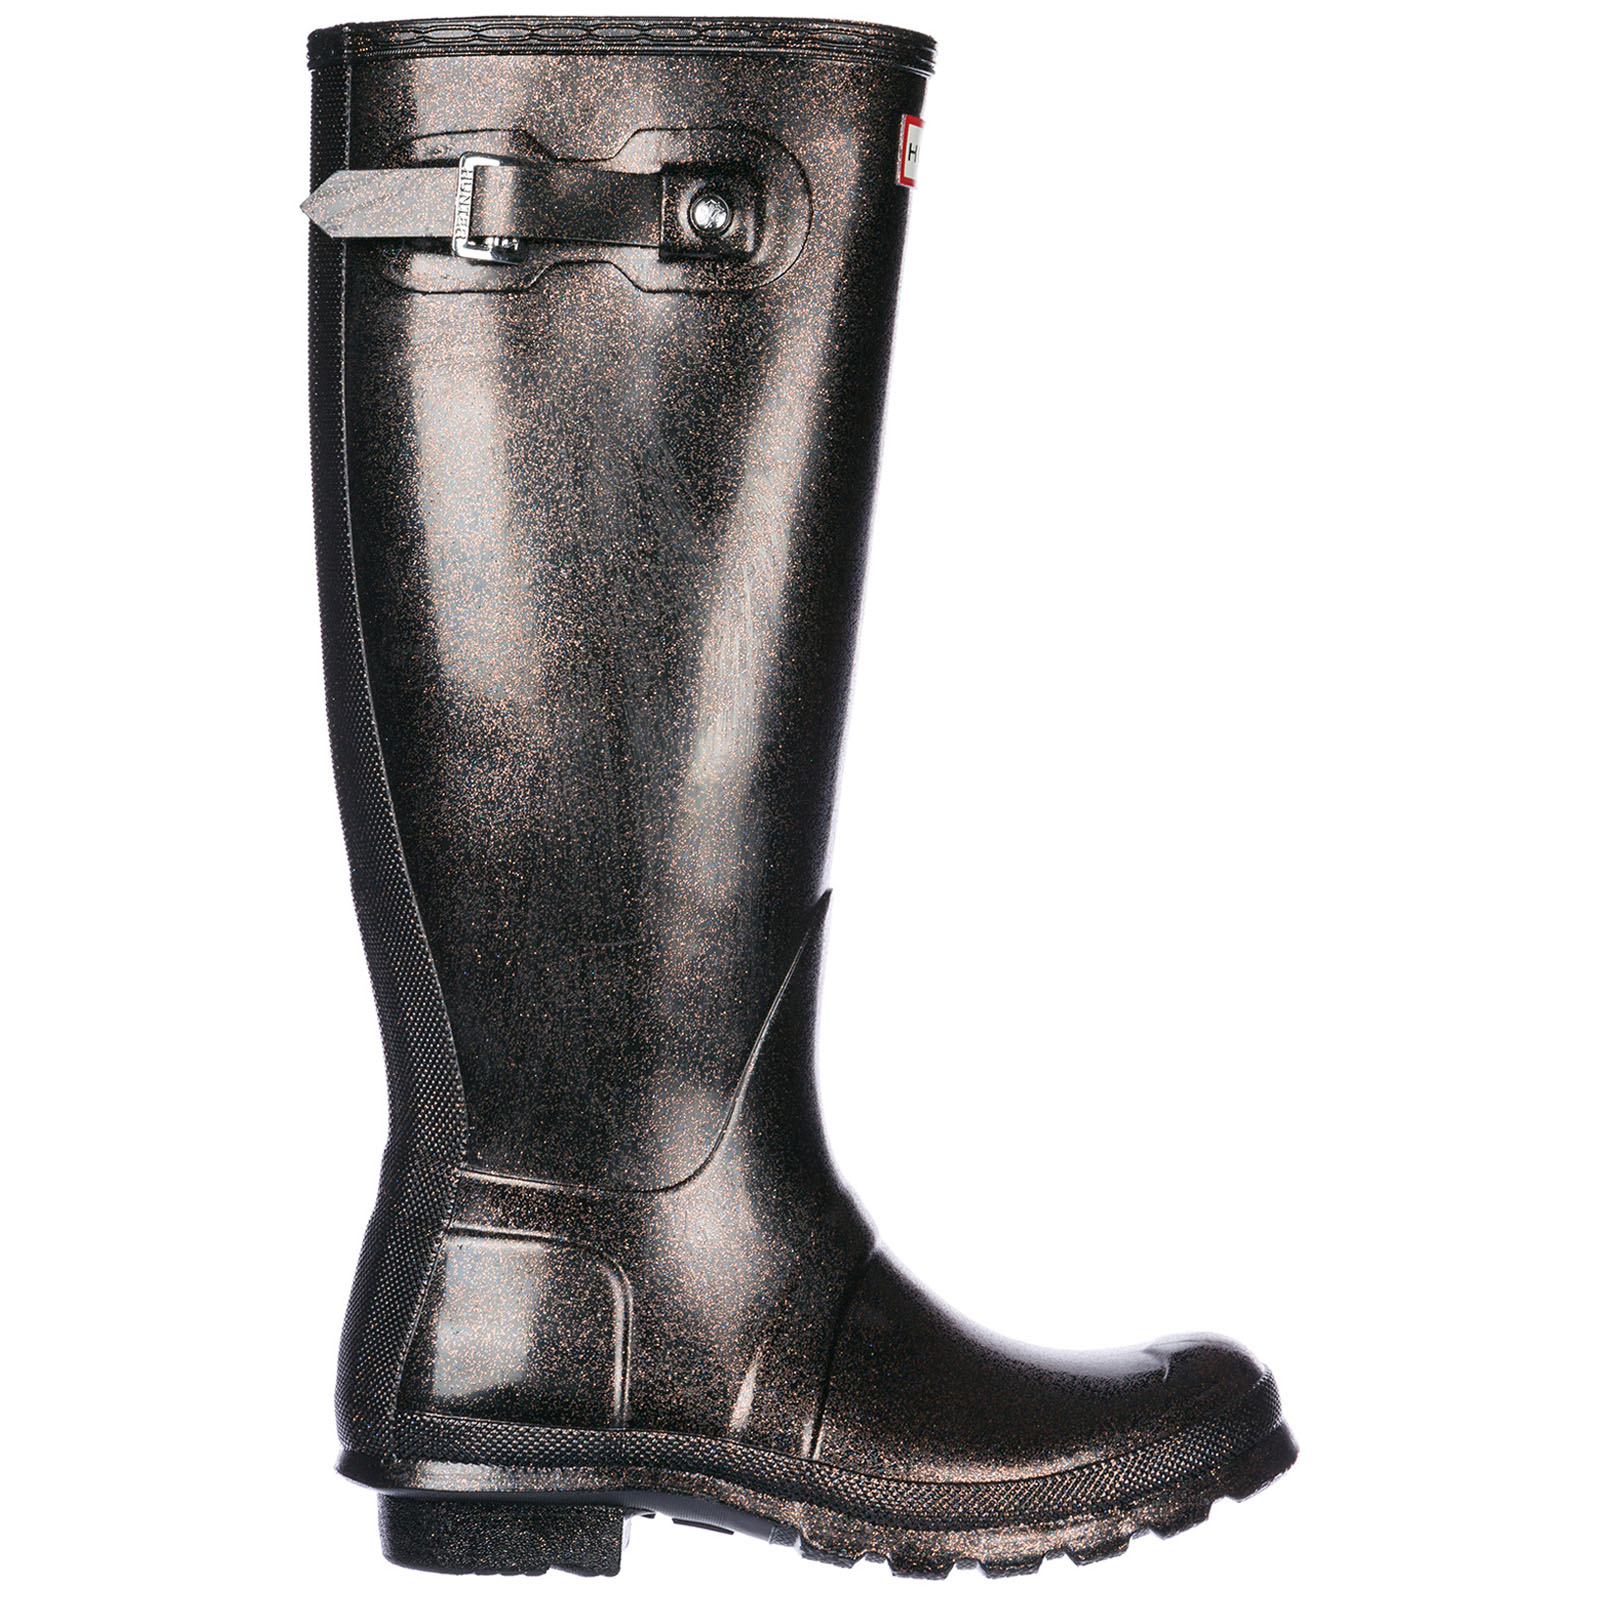 Gummi regen stiefel damen boots wellington tall starcloud